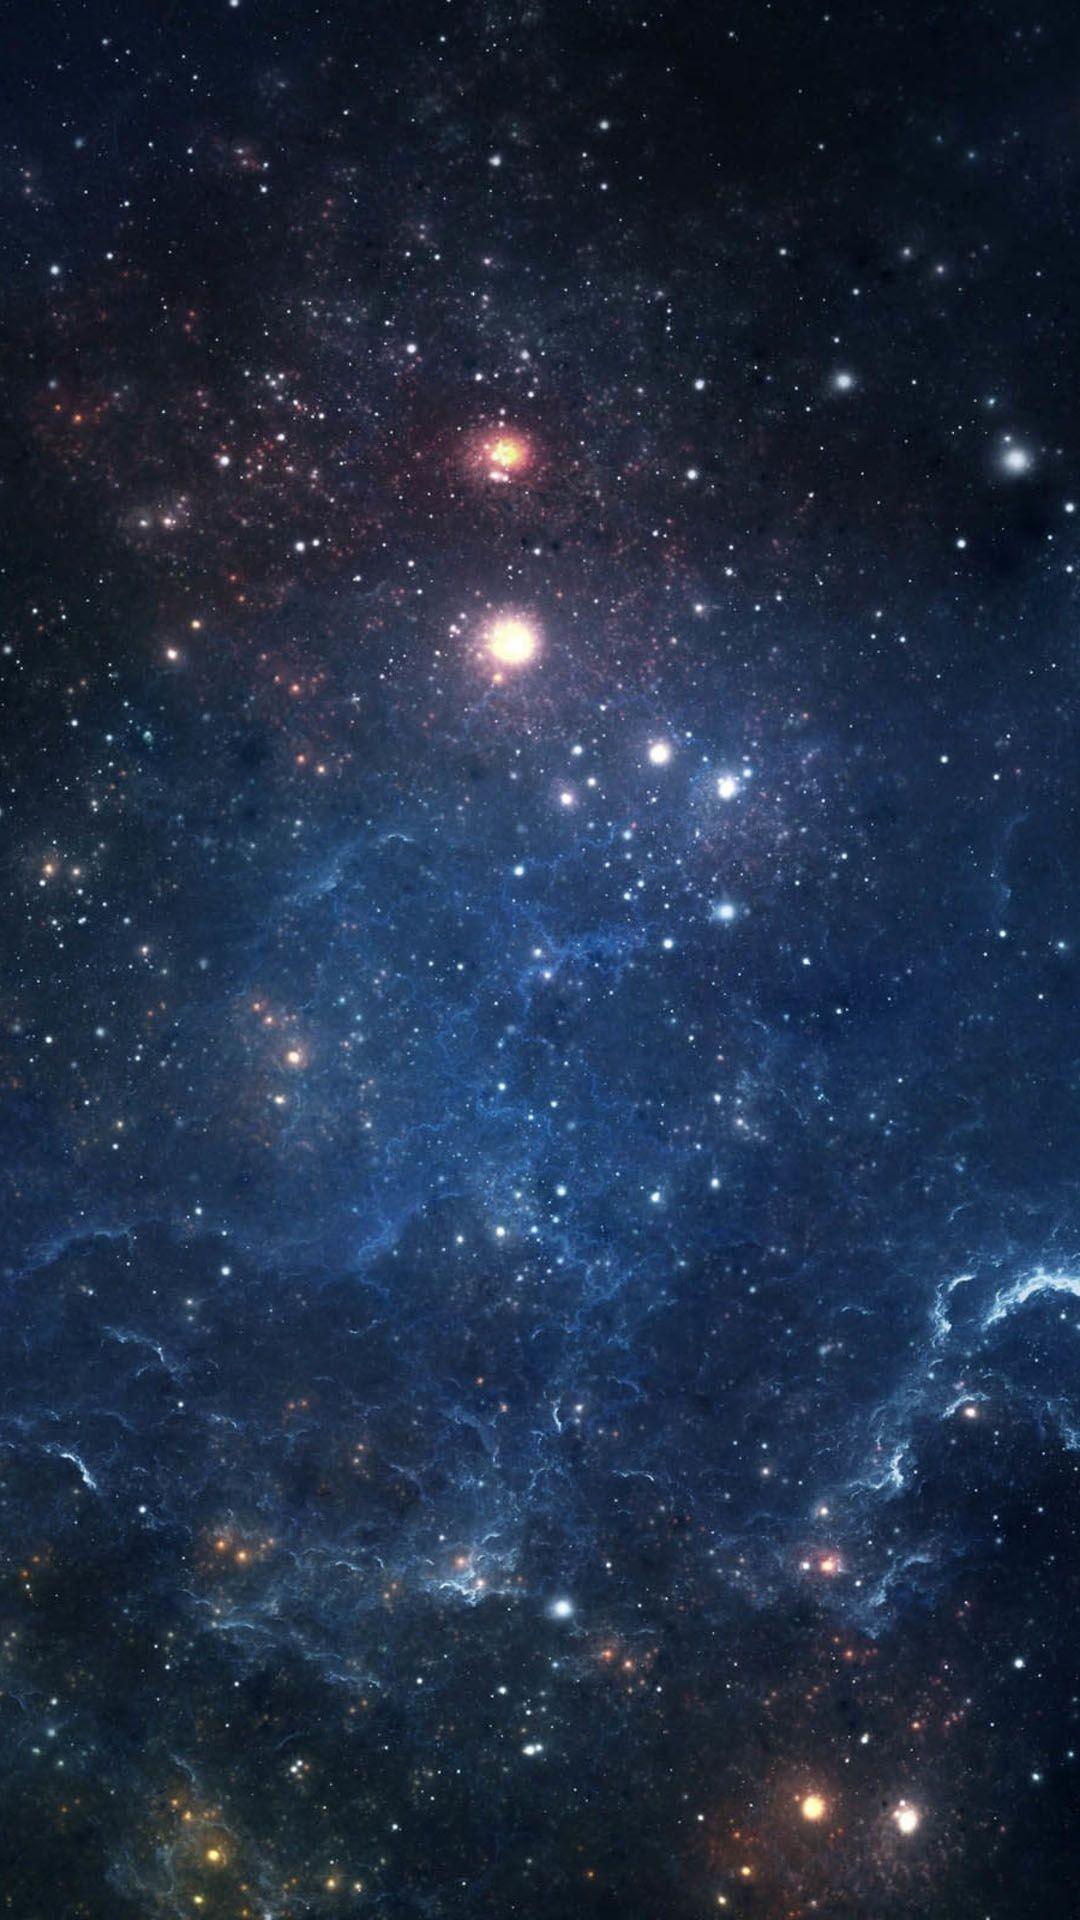 Galaxy Wallpaper For Smartphone 90251 Hd Wallpaper